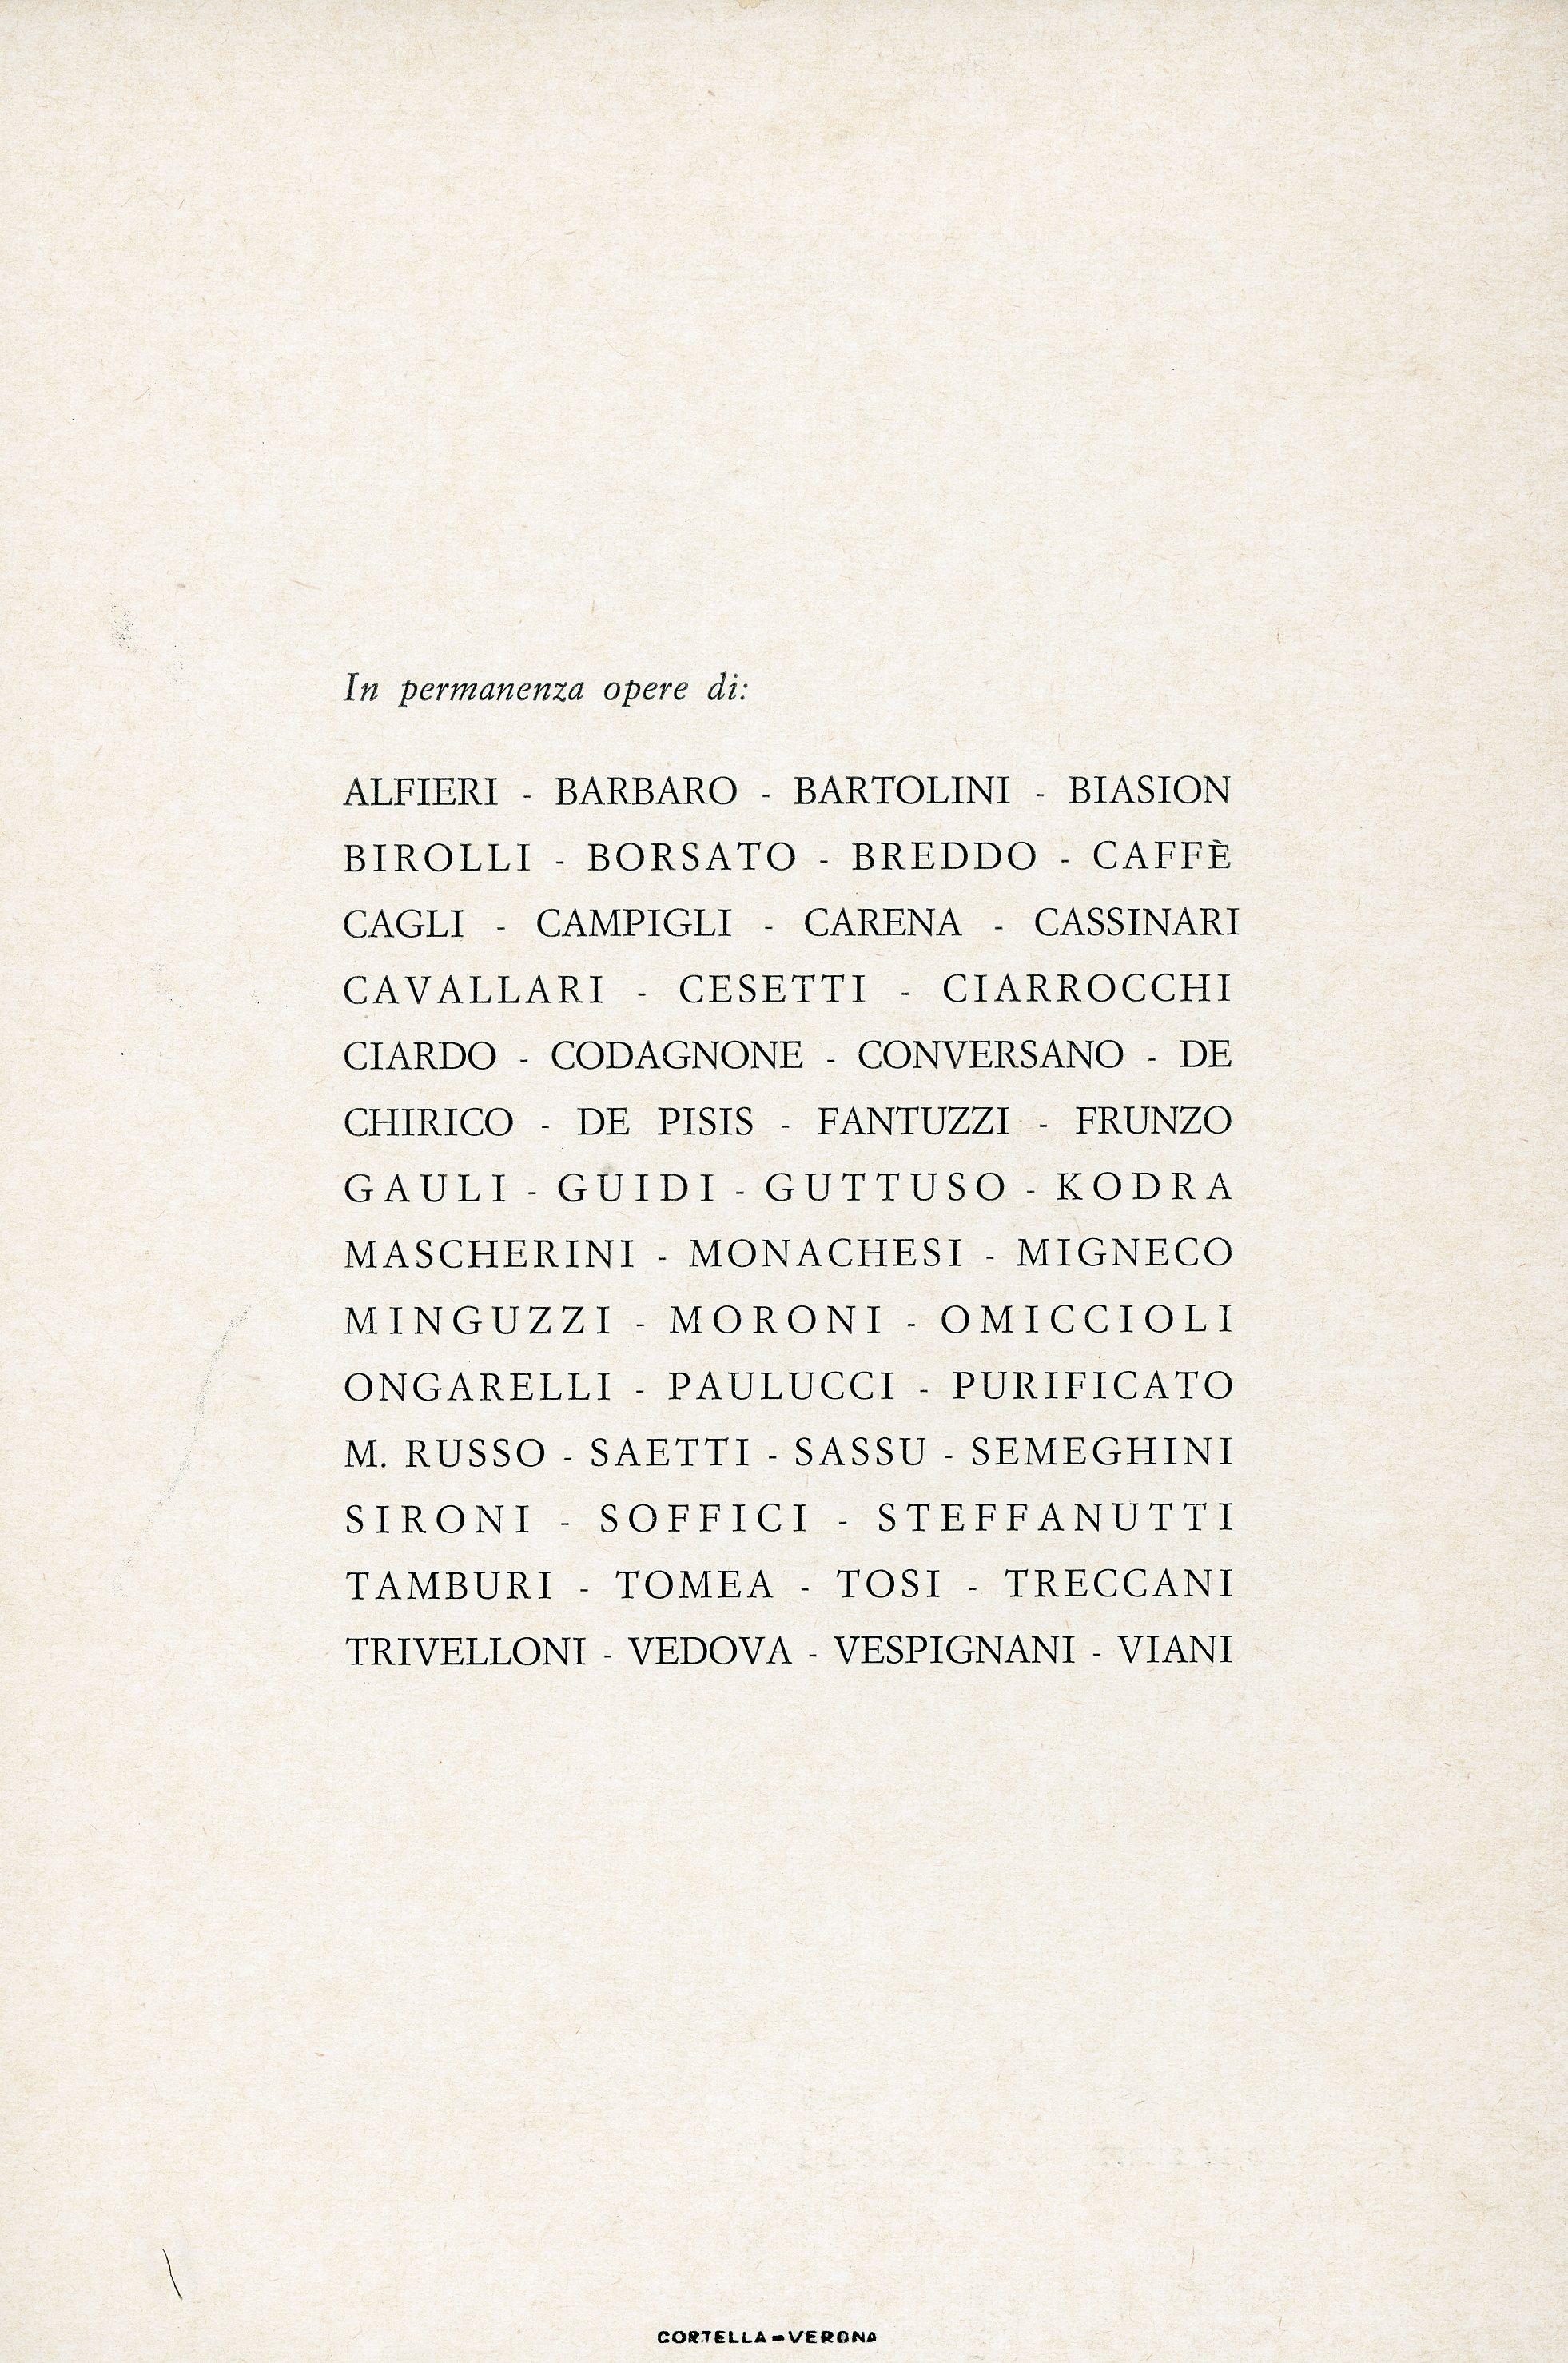 1967-02 Libreria Ghelfi - Bruno Caruso_02.jpg